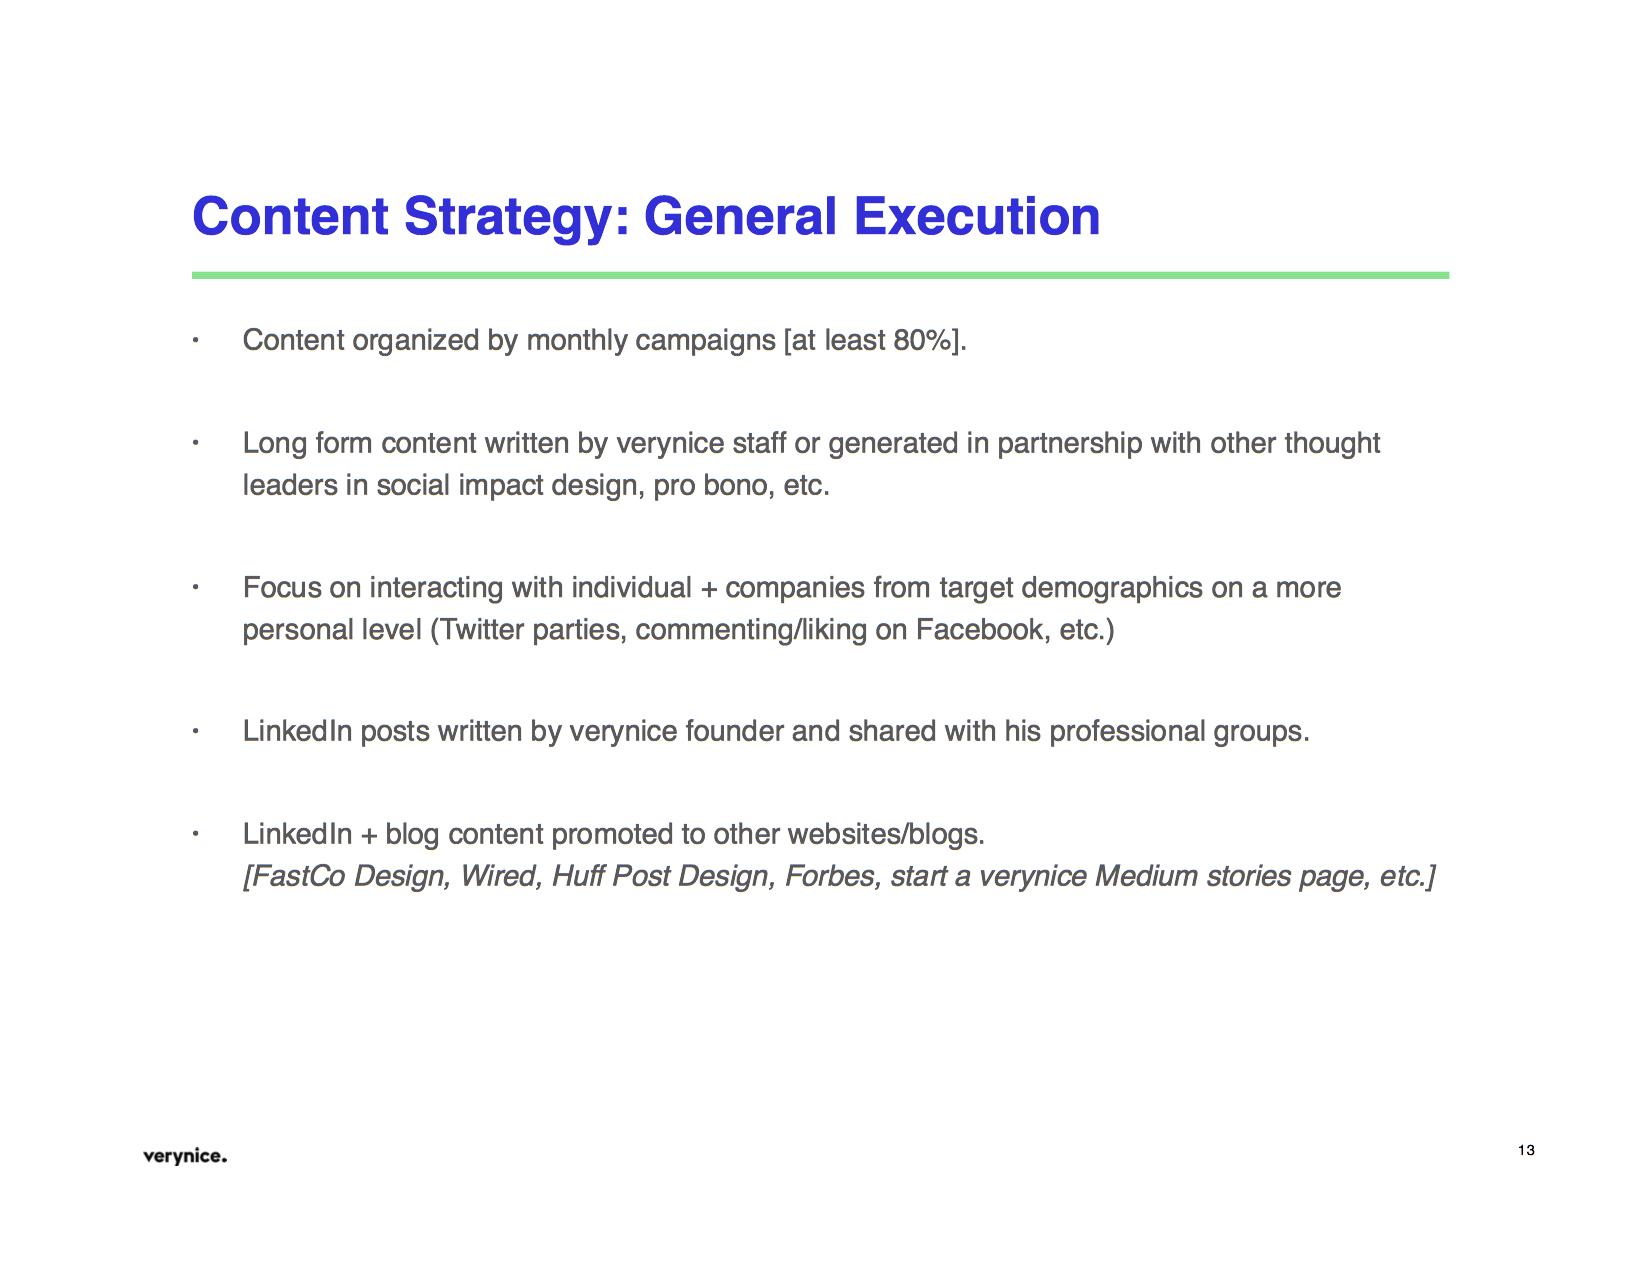 6verynice_Content_Strategy.jpg